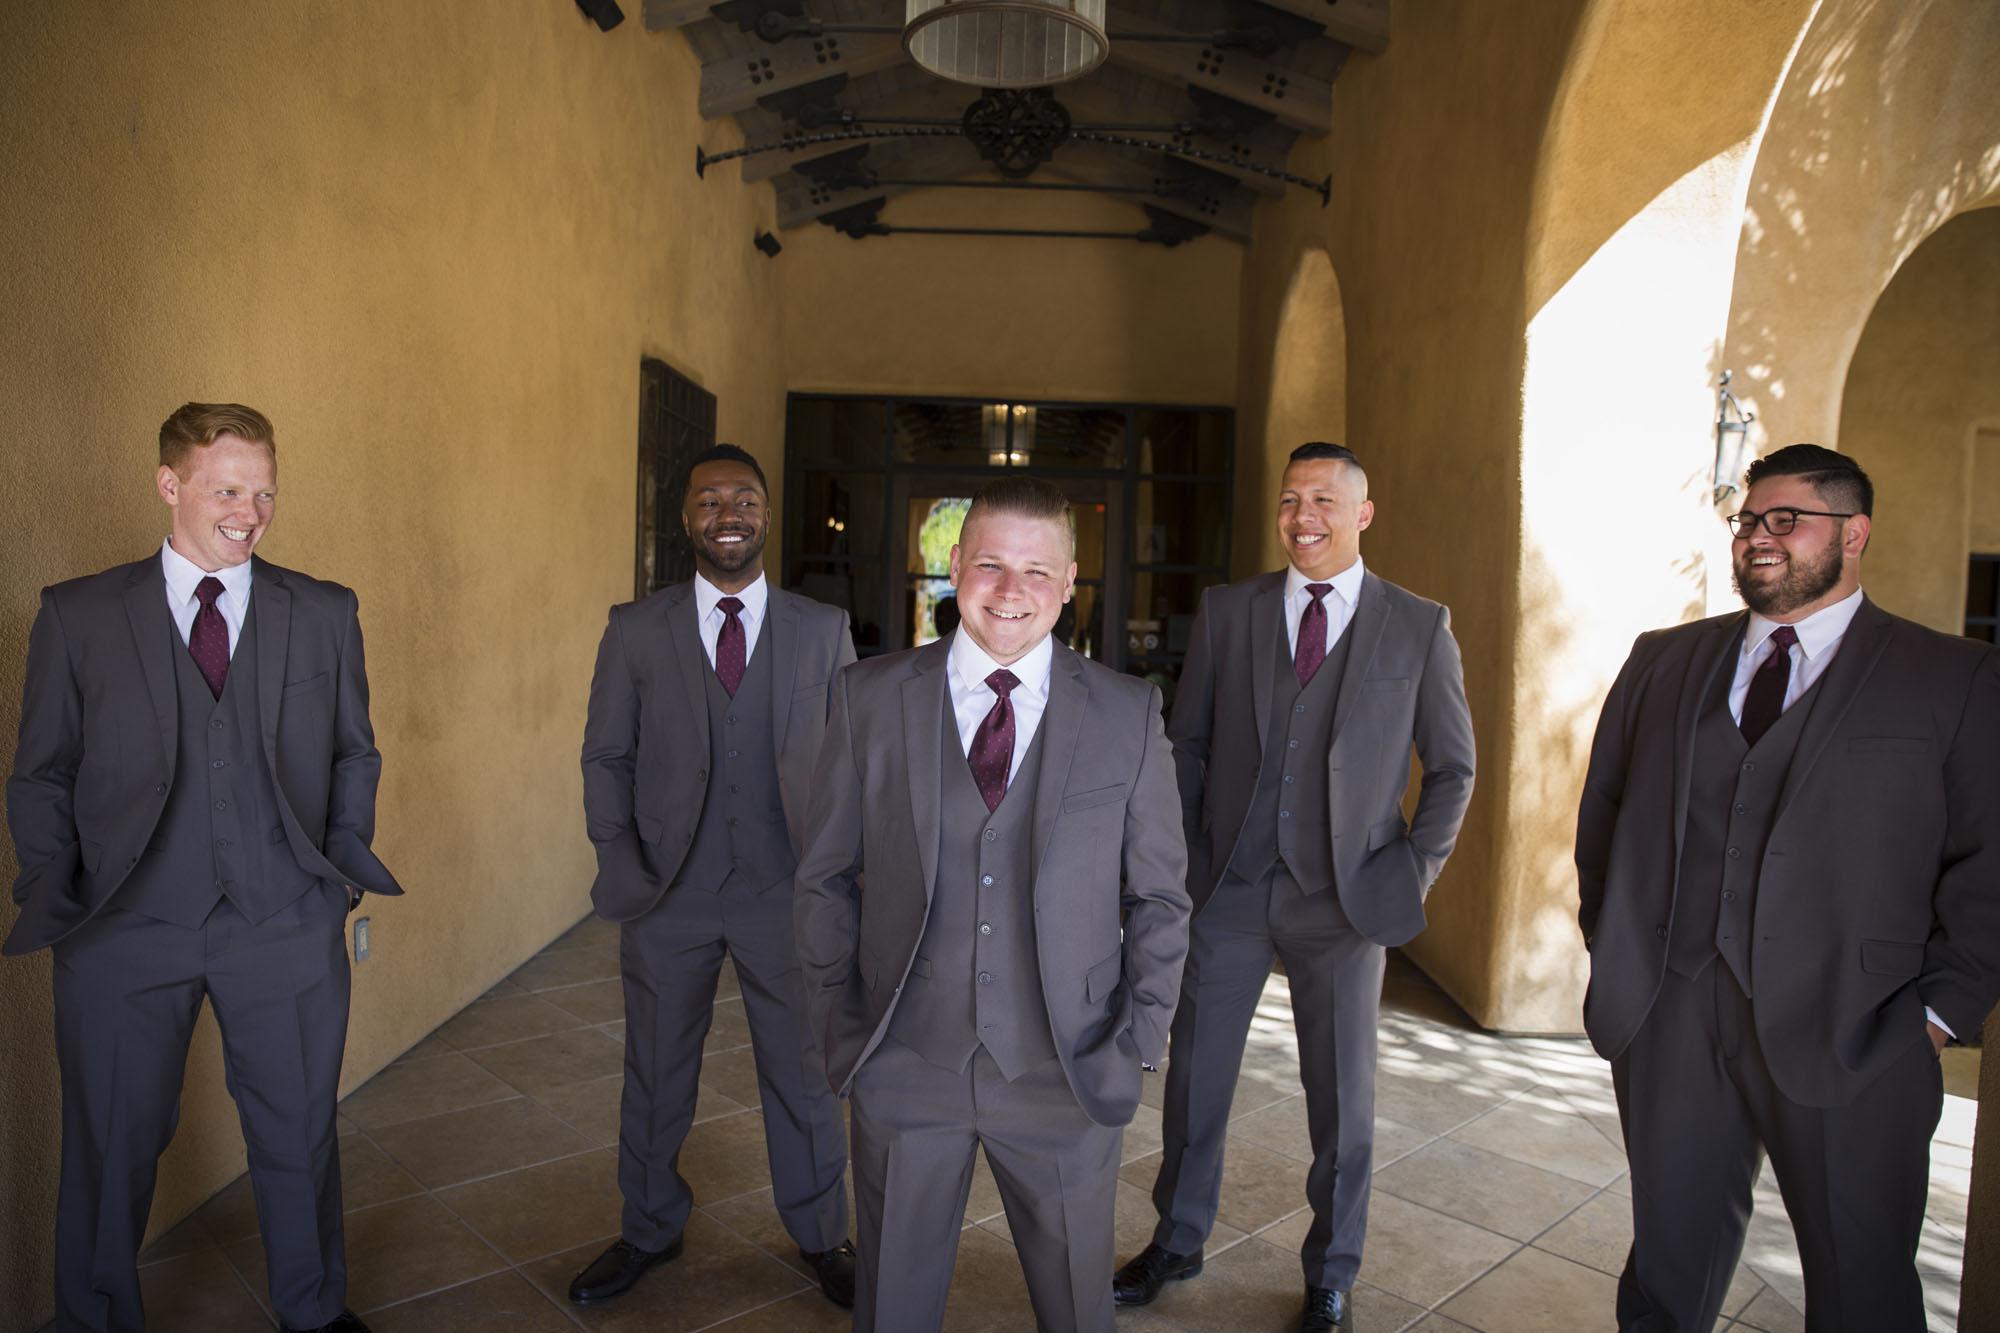 Classy groomsmen in archway